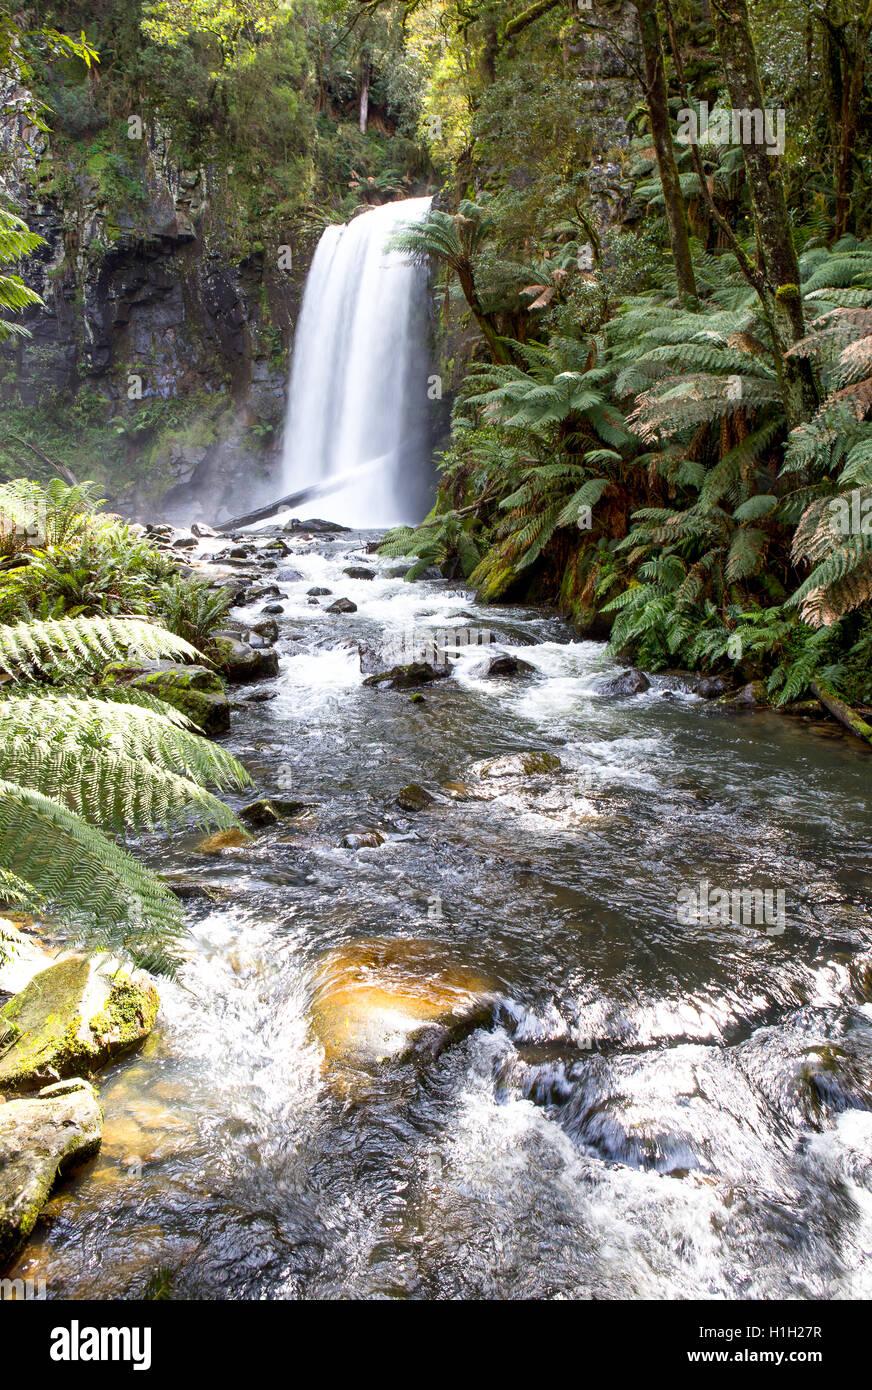 Waterfall, Rainforest - Stock Image